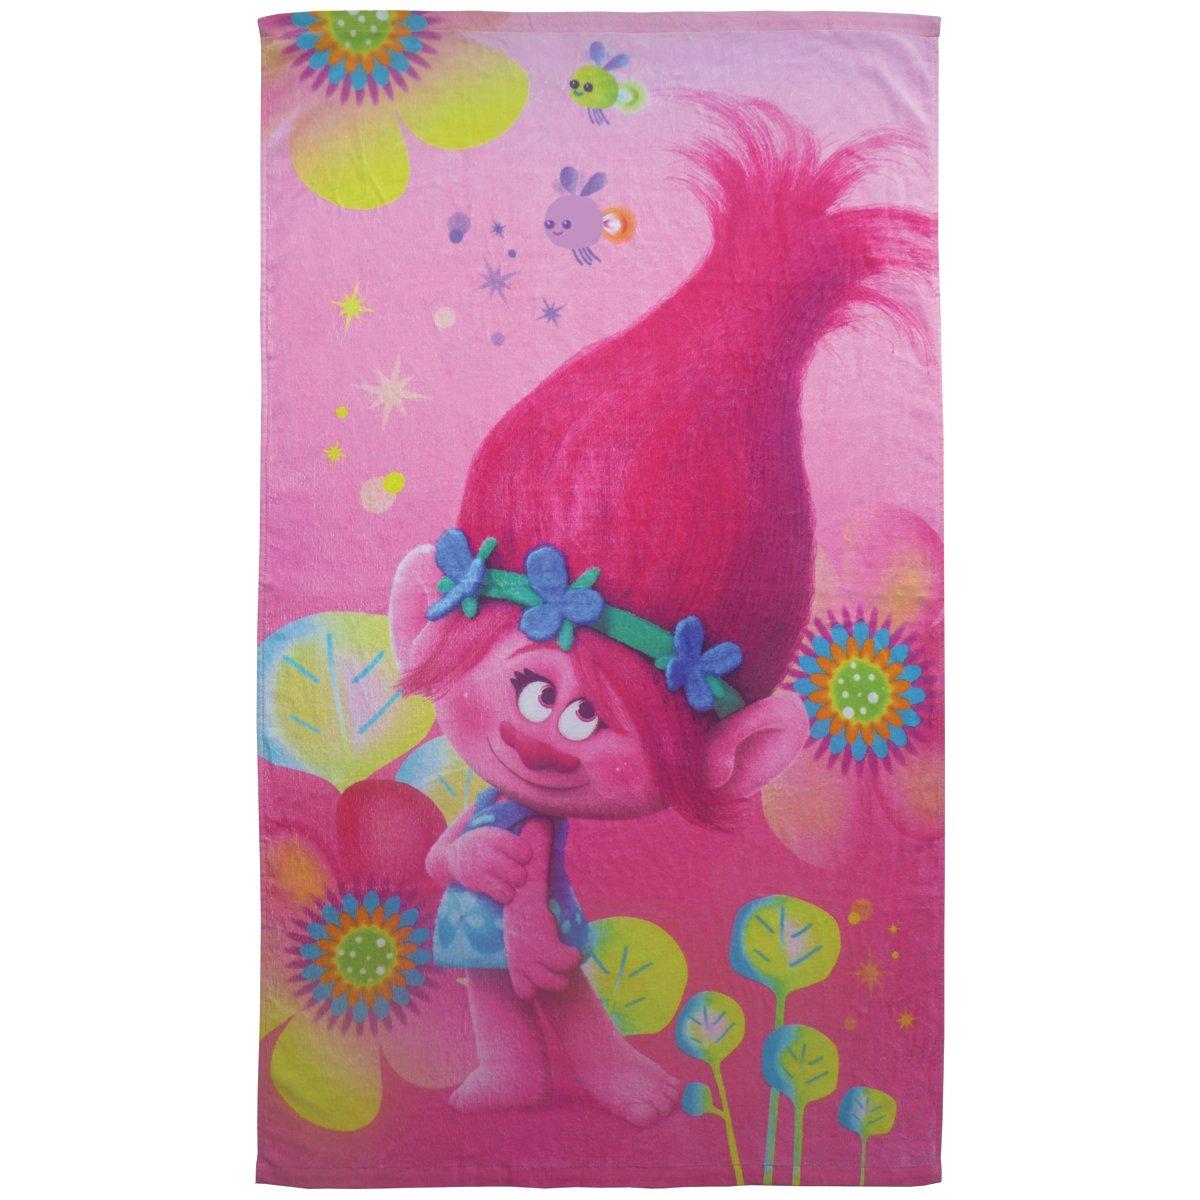 CTI Trolls Poppy Drap de Plage Coton Rose 70 x 120 cm